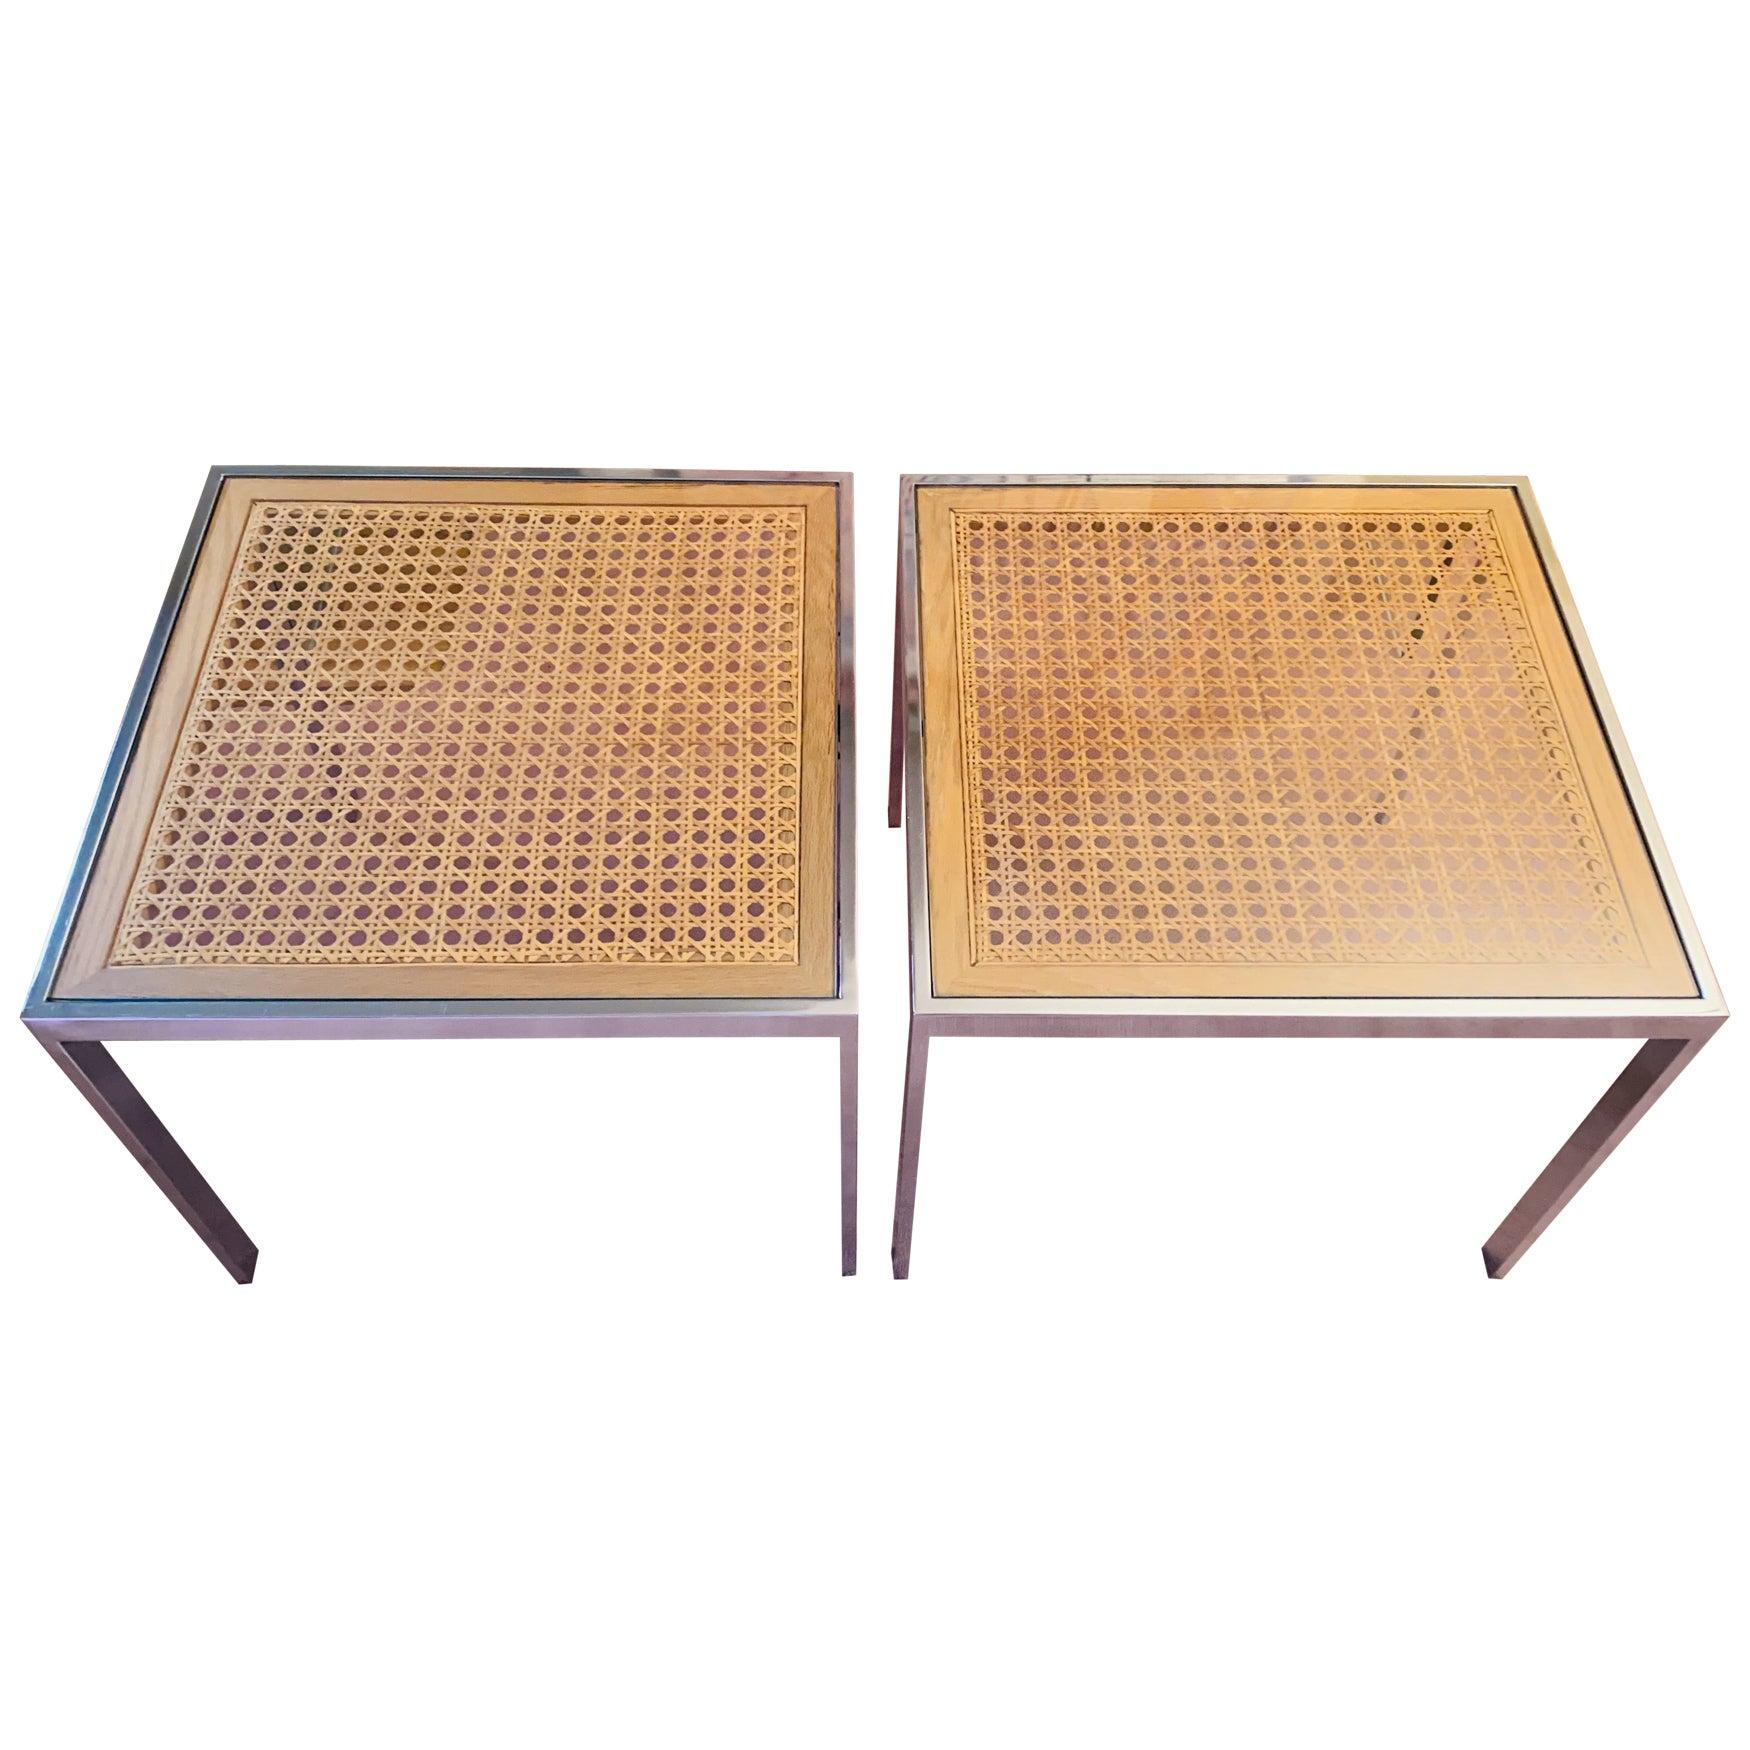 Modern Chrome and Cane Milo Baughman Style Side Tables, a Pair